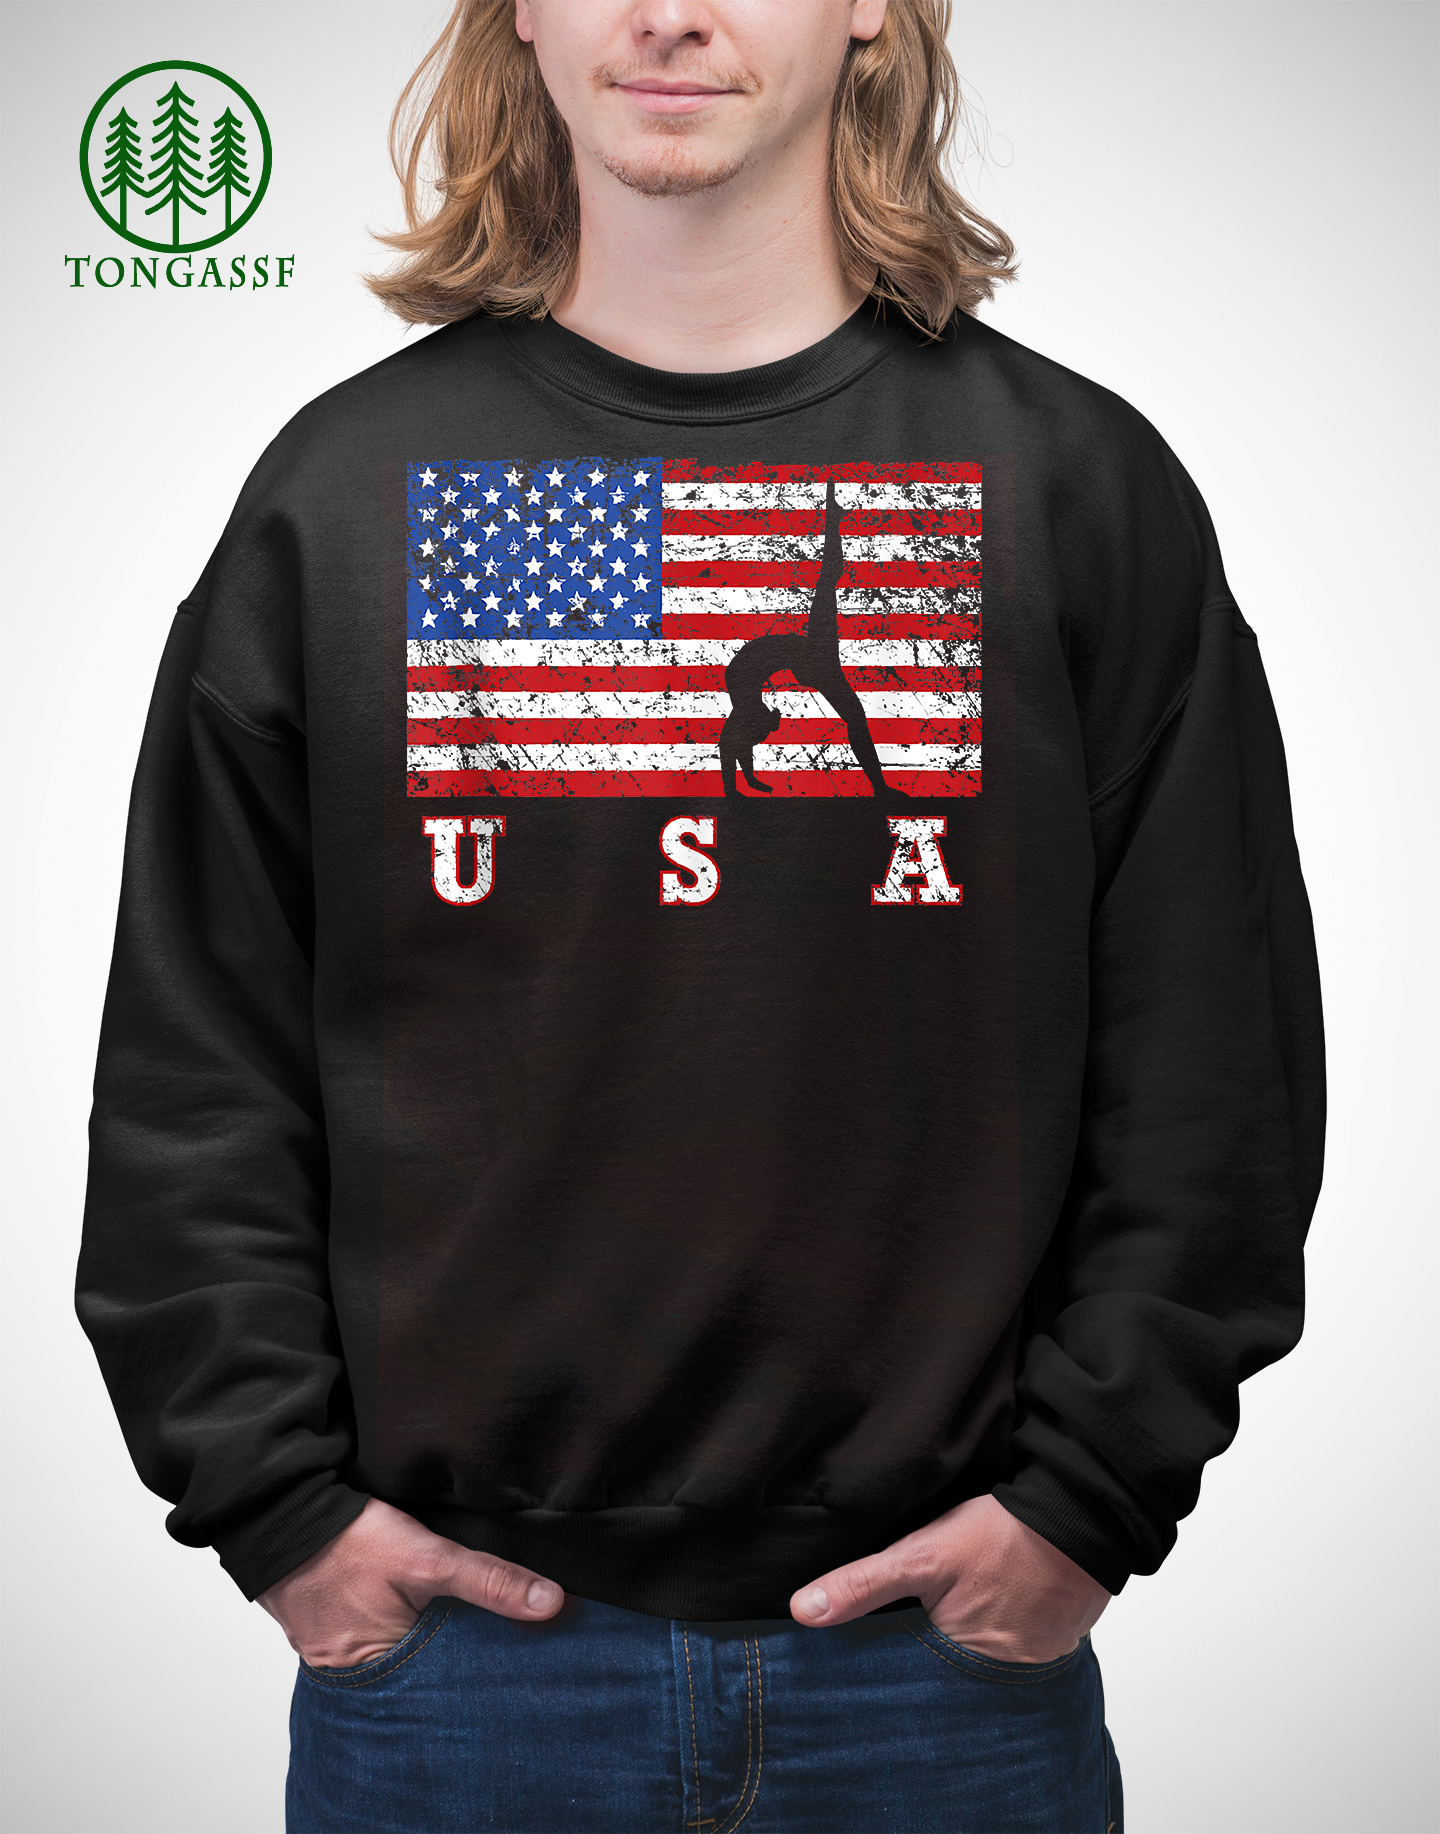 American Flag Gymnastics USA Gift Tumbling Team Sweatshirt